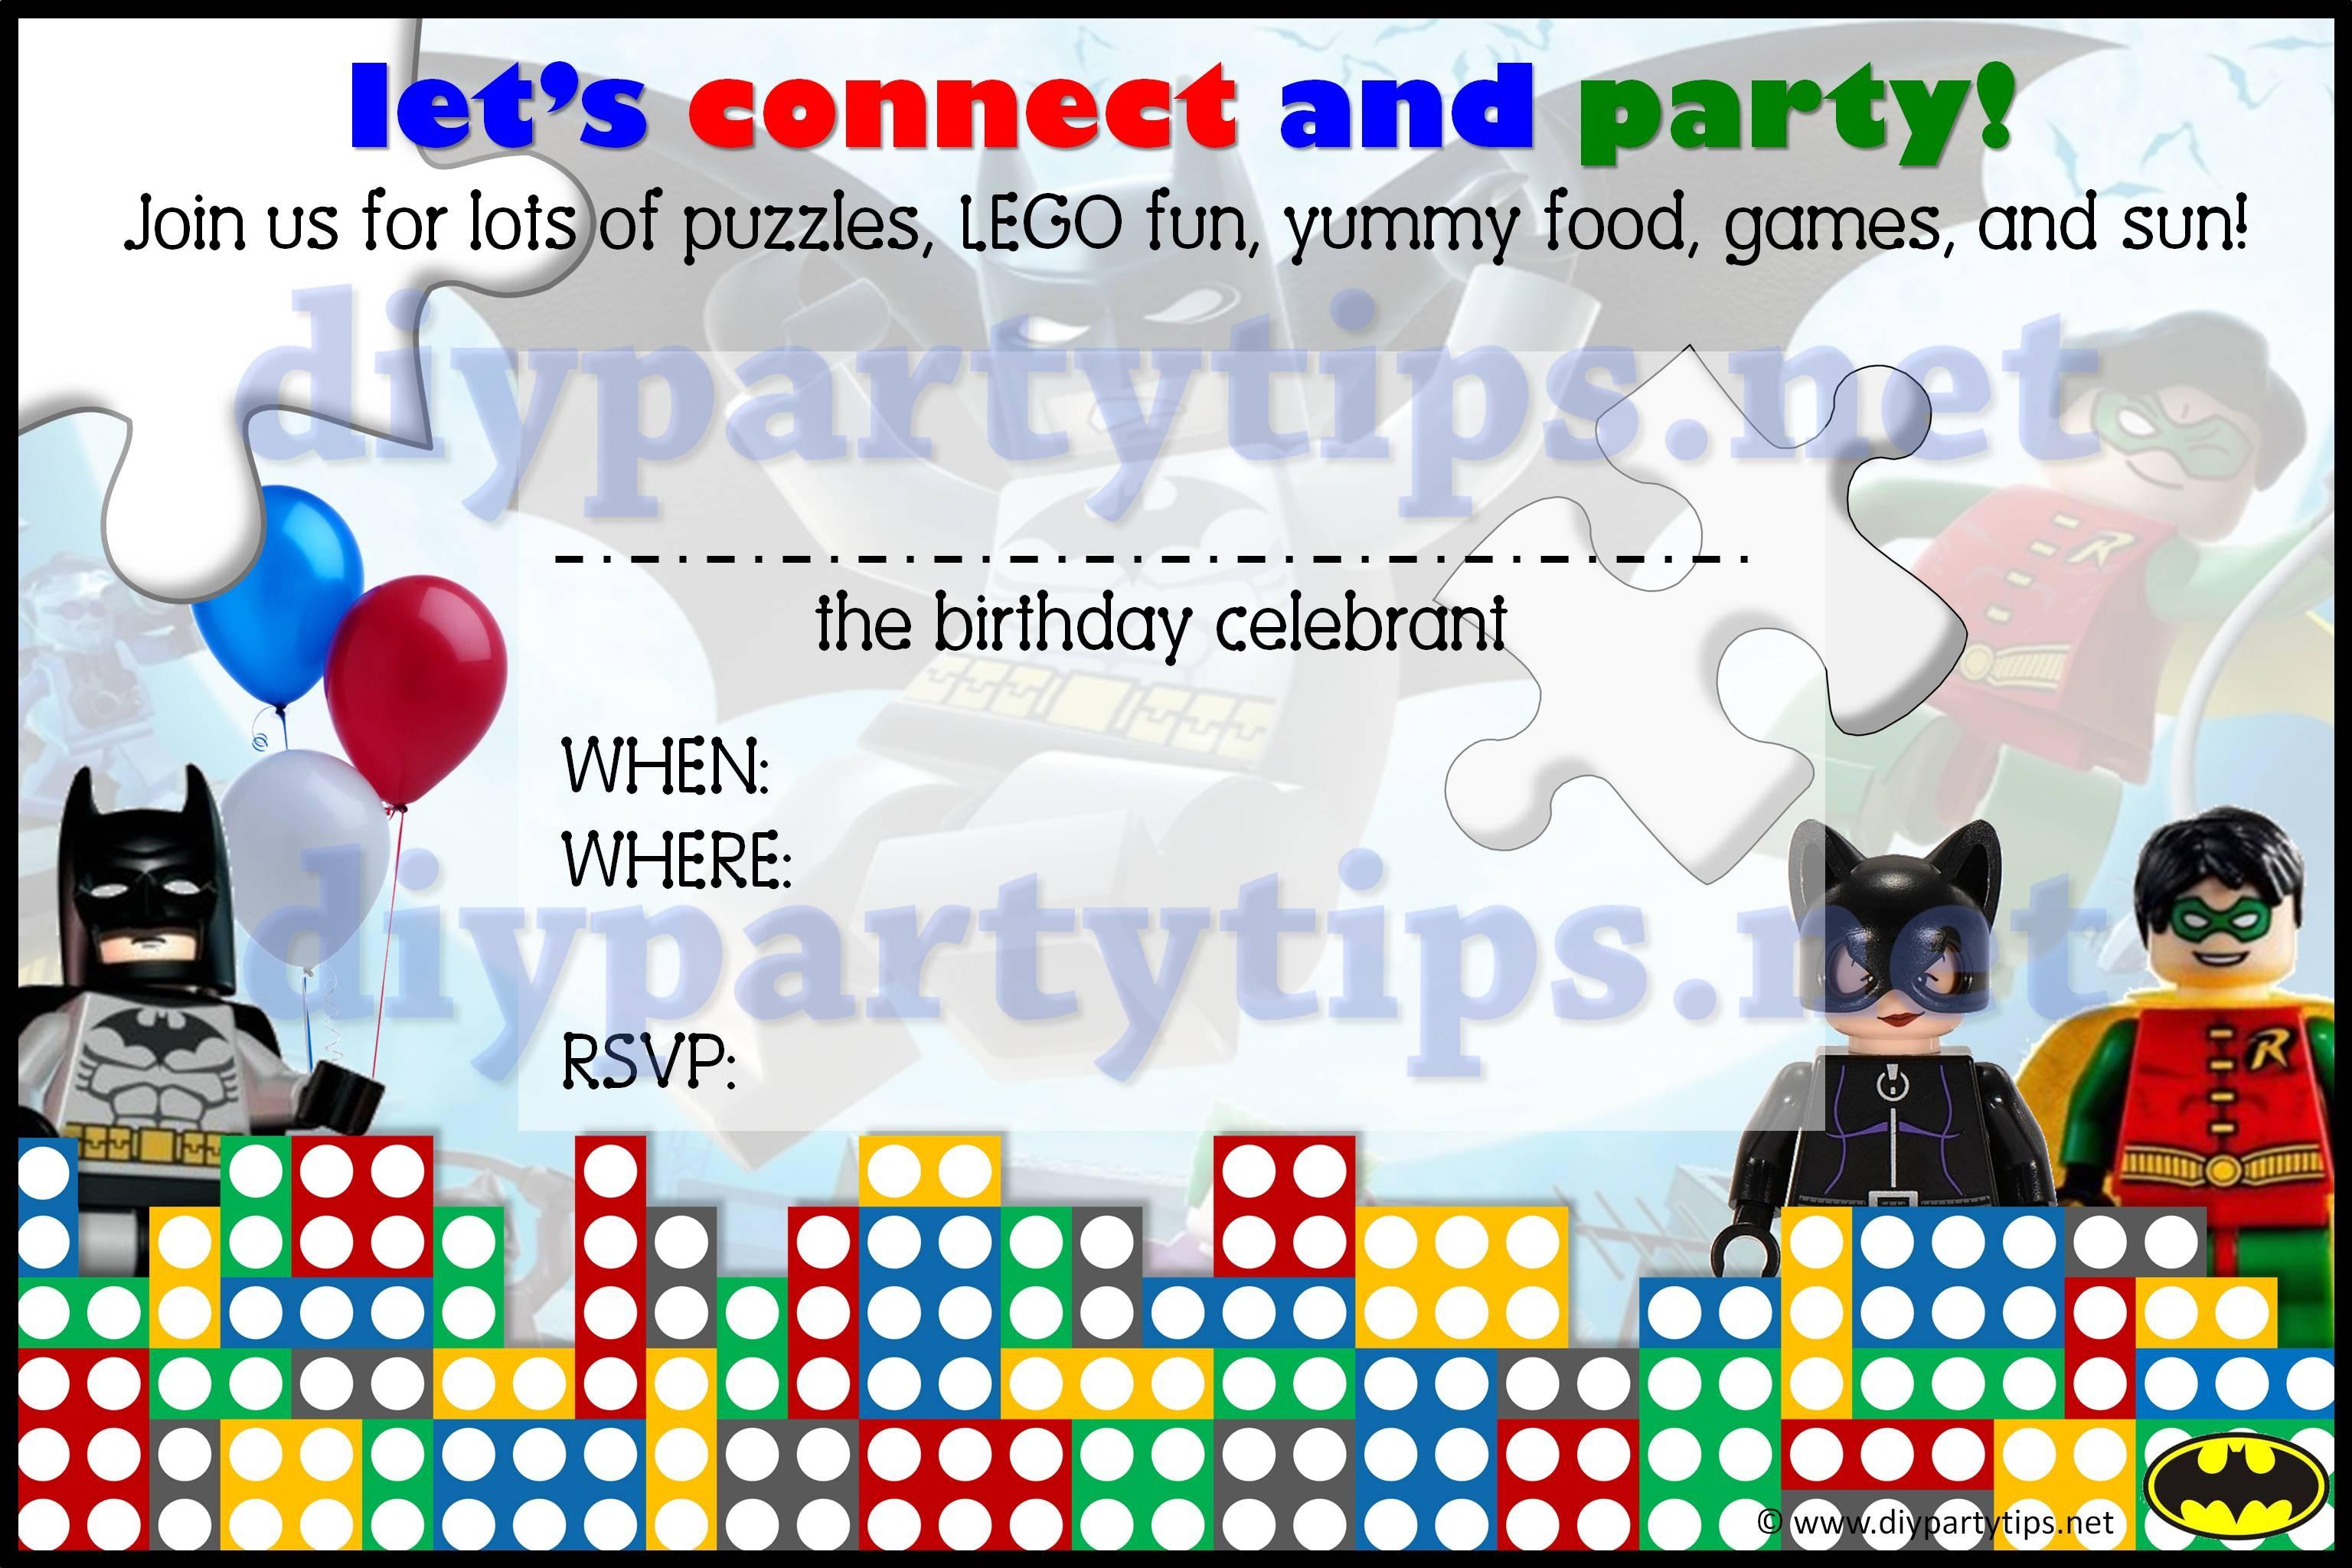 Free Printable: Lego Party Invitation – Lola's Diy Party Tips - Transformers Party Invitations Free Printable